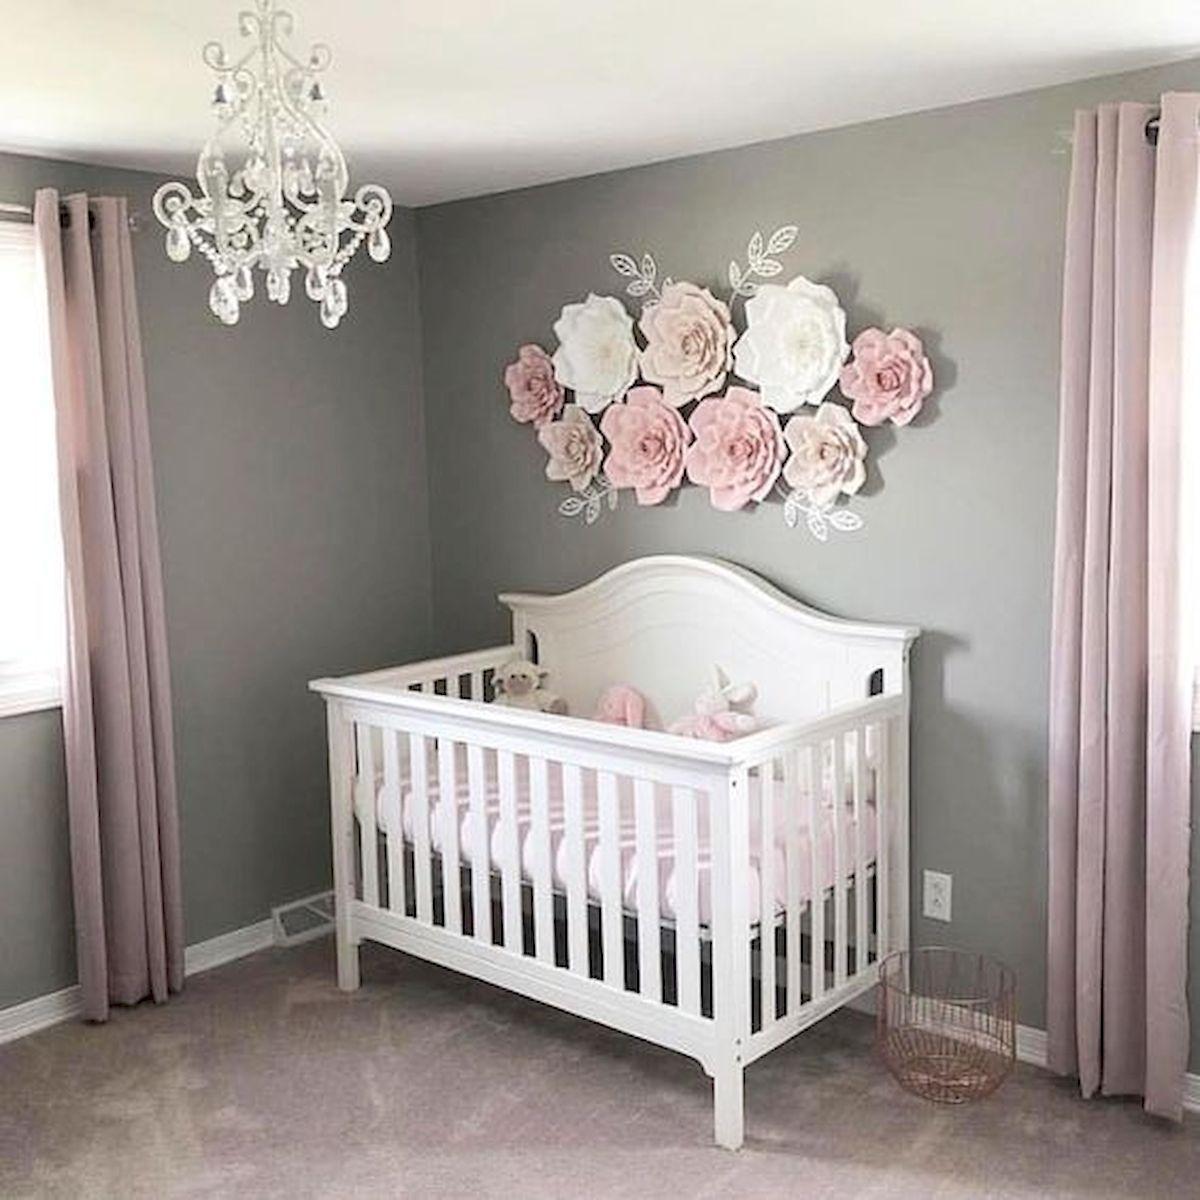 33 Adorable Nursery Room Ideas For Baby Girl Baby Girl Nursery Room Baby Girl Bedroom Baby Girl Room